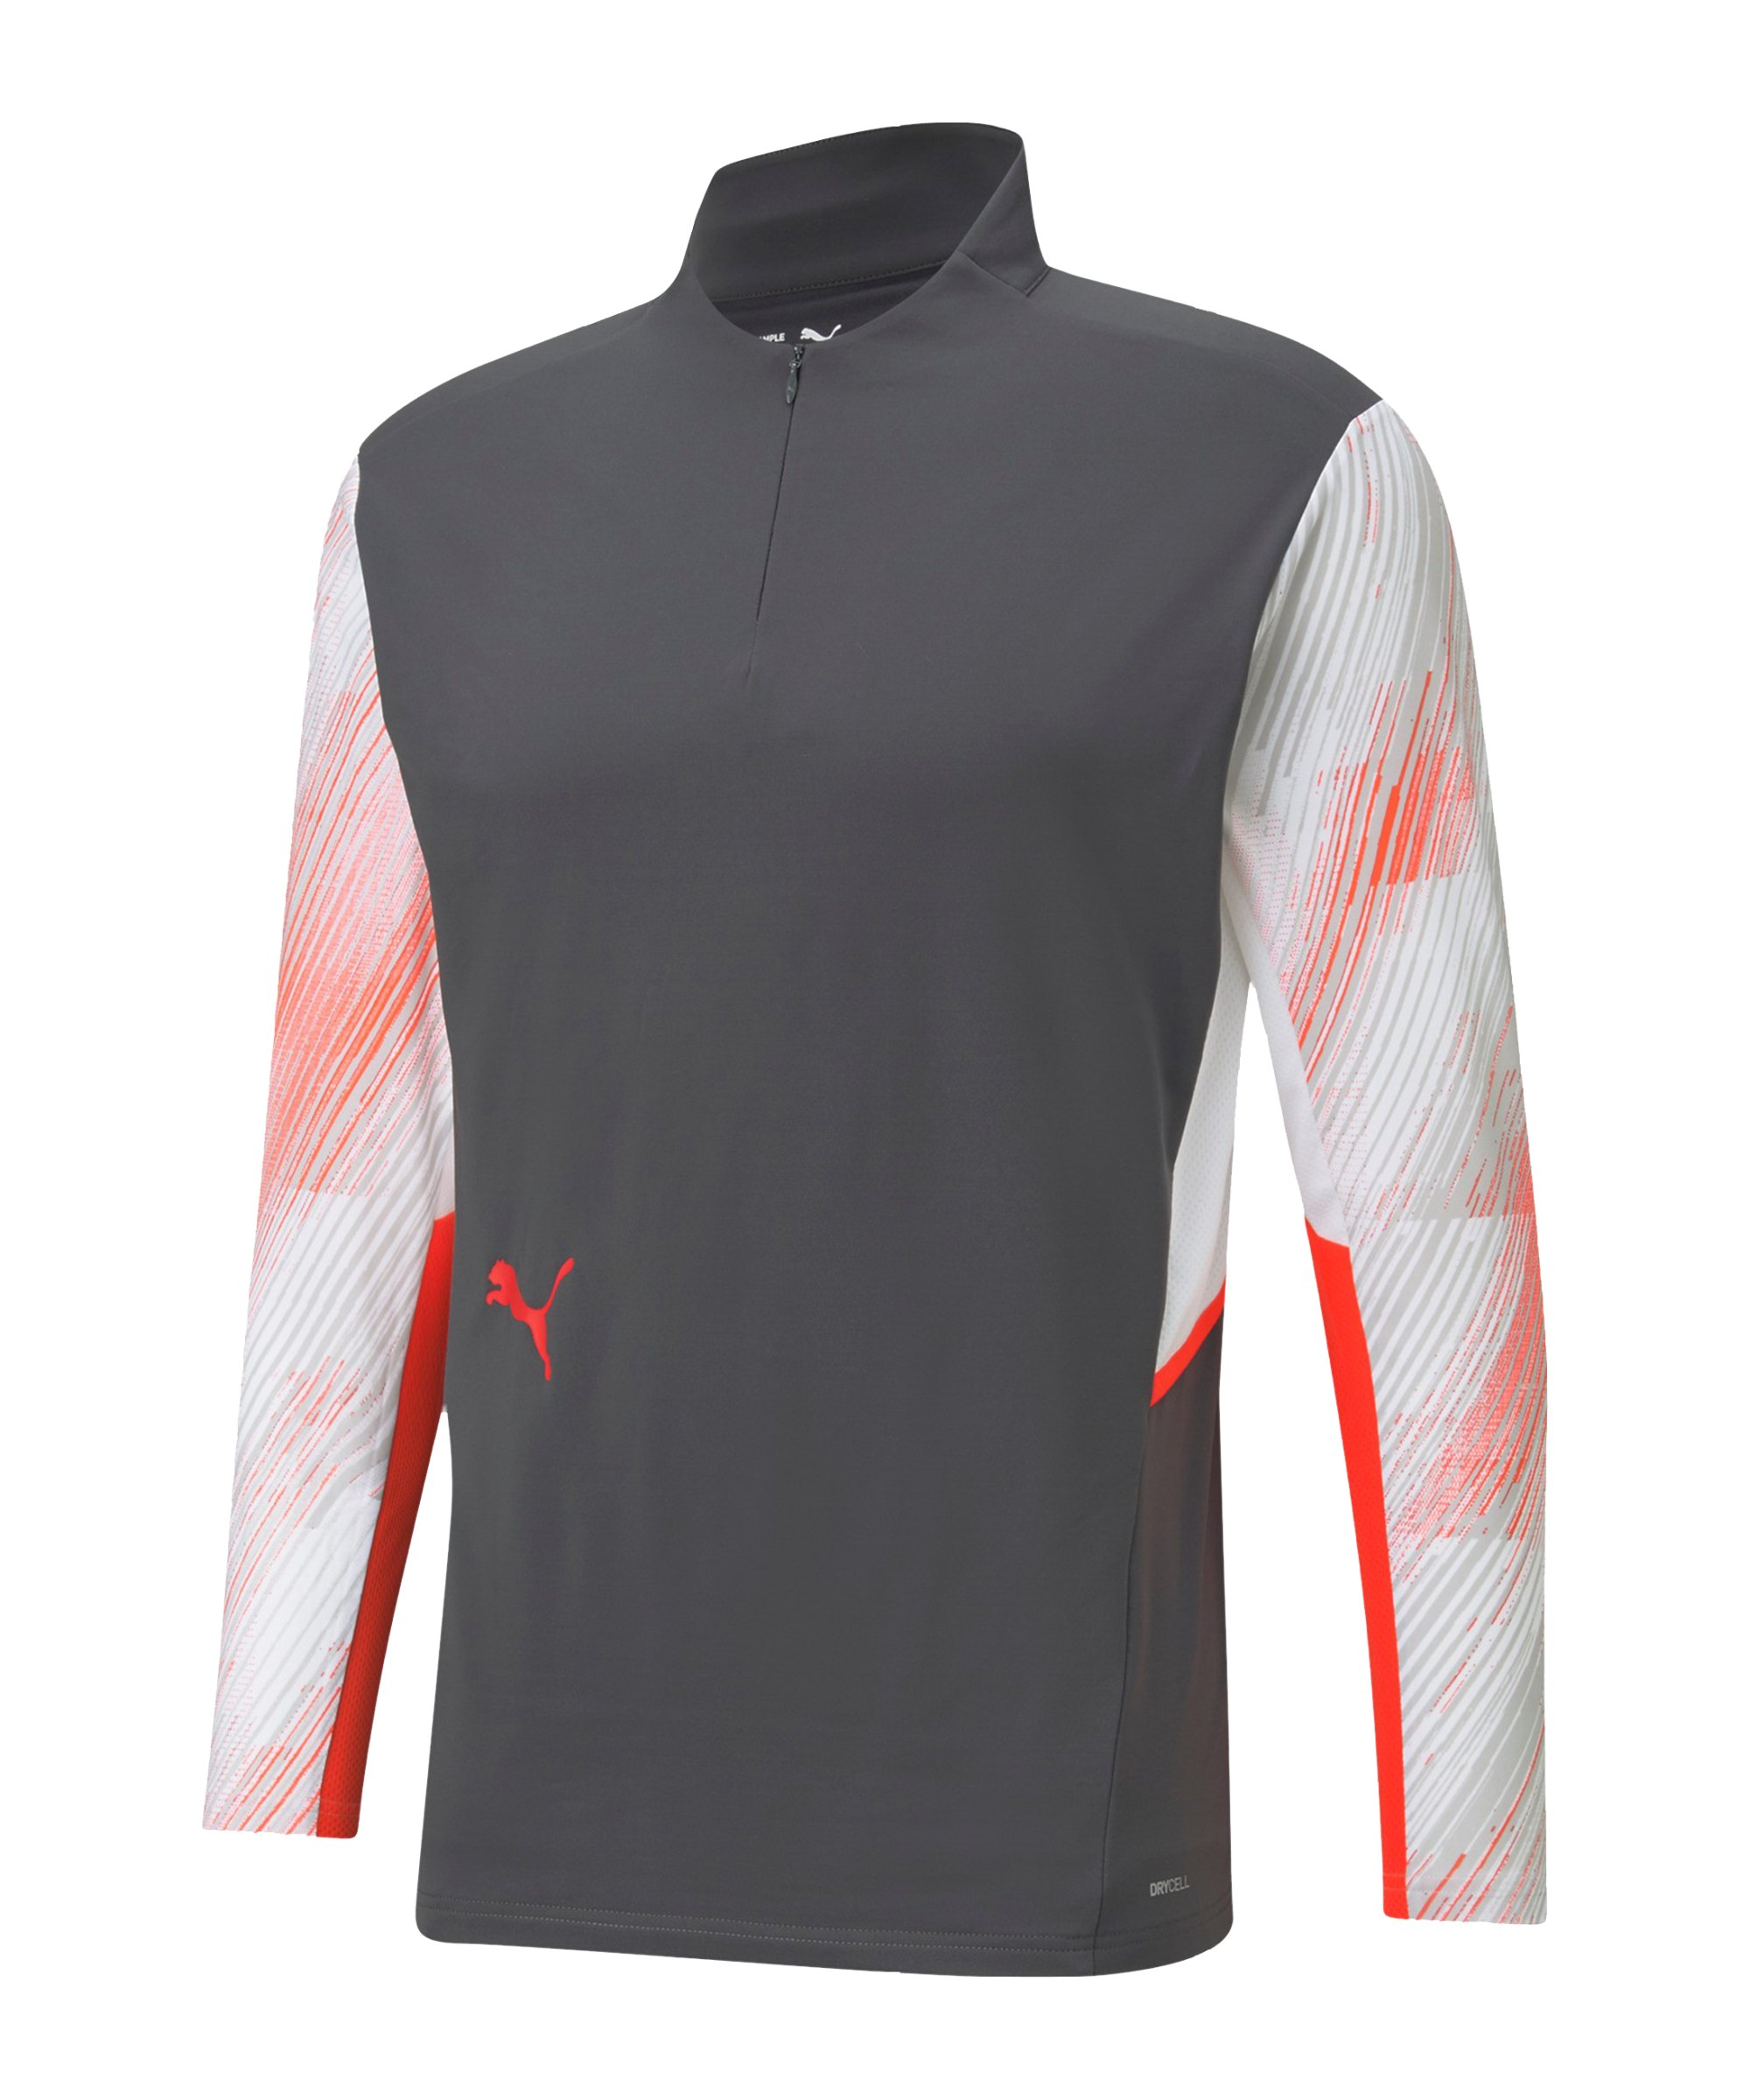 PUMA individualCUP HalfZip Sweatshirt Weiss F41 - grau